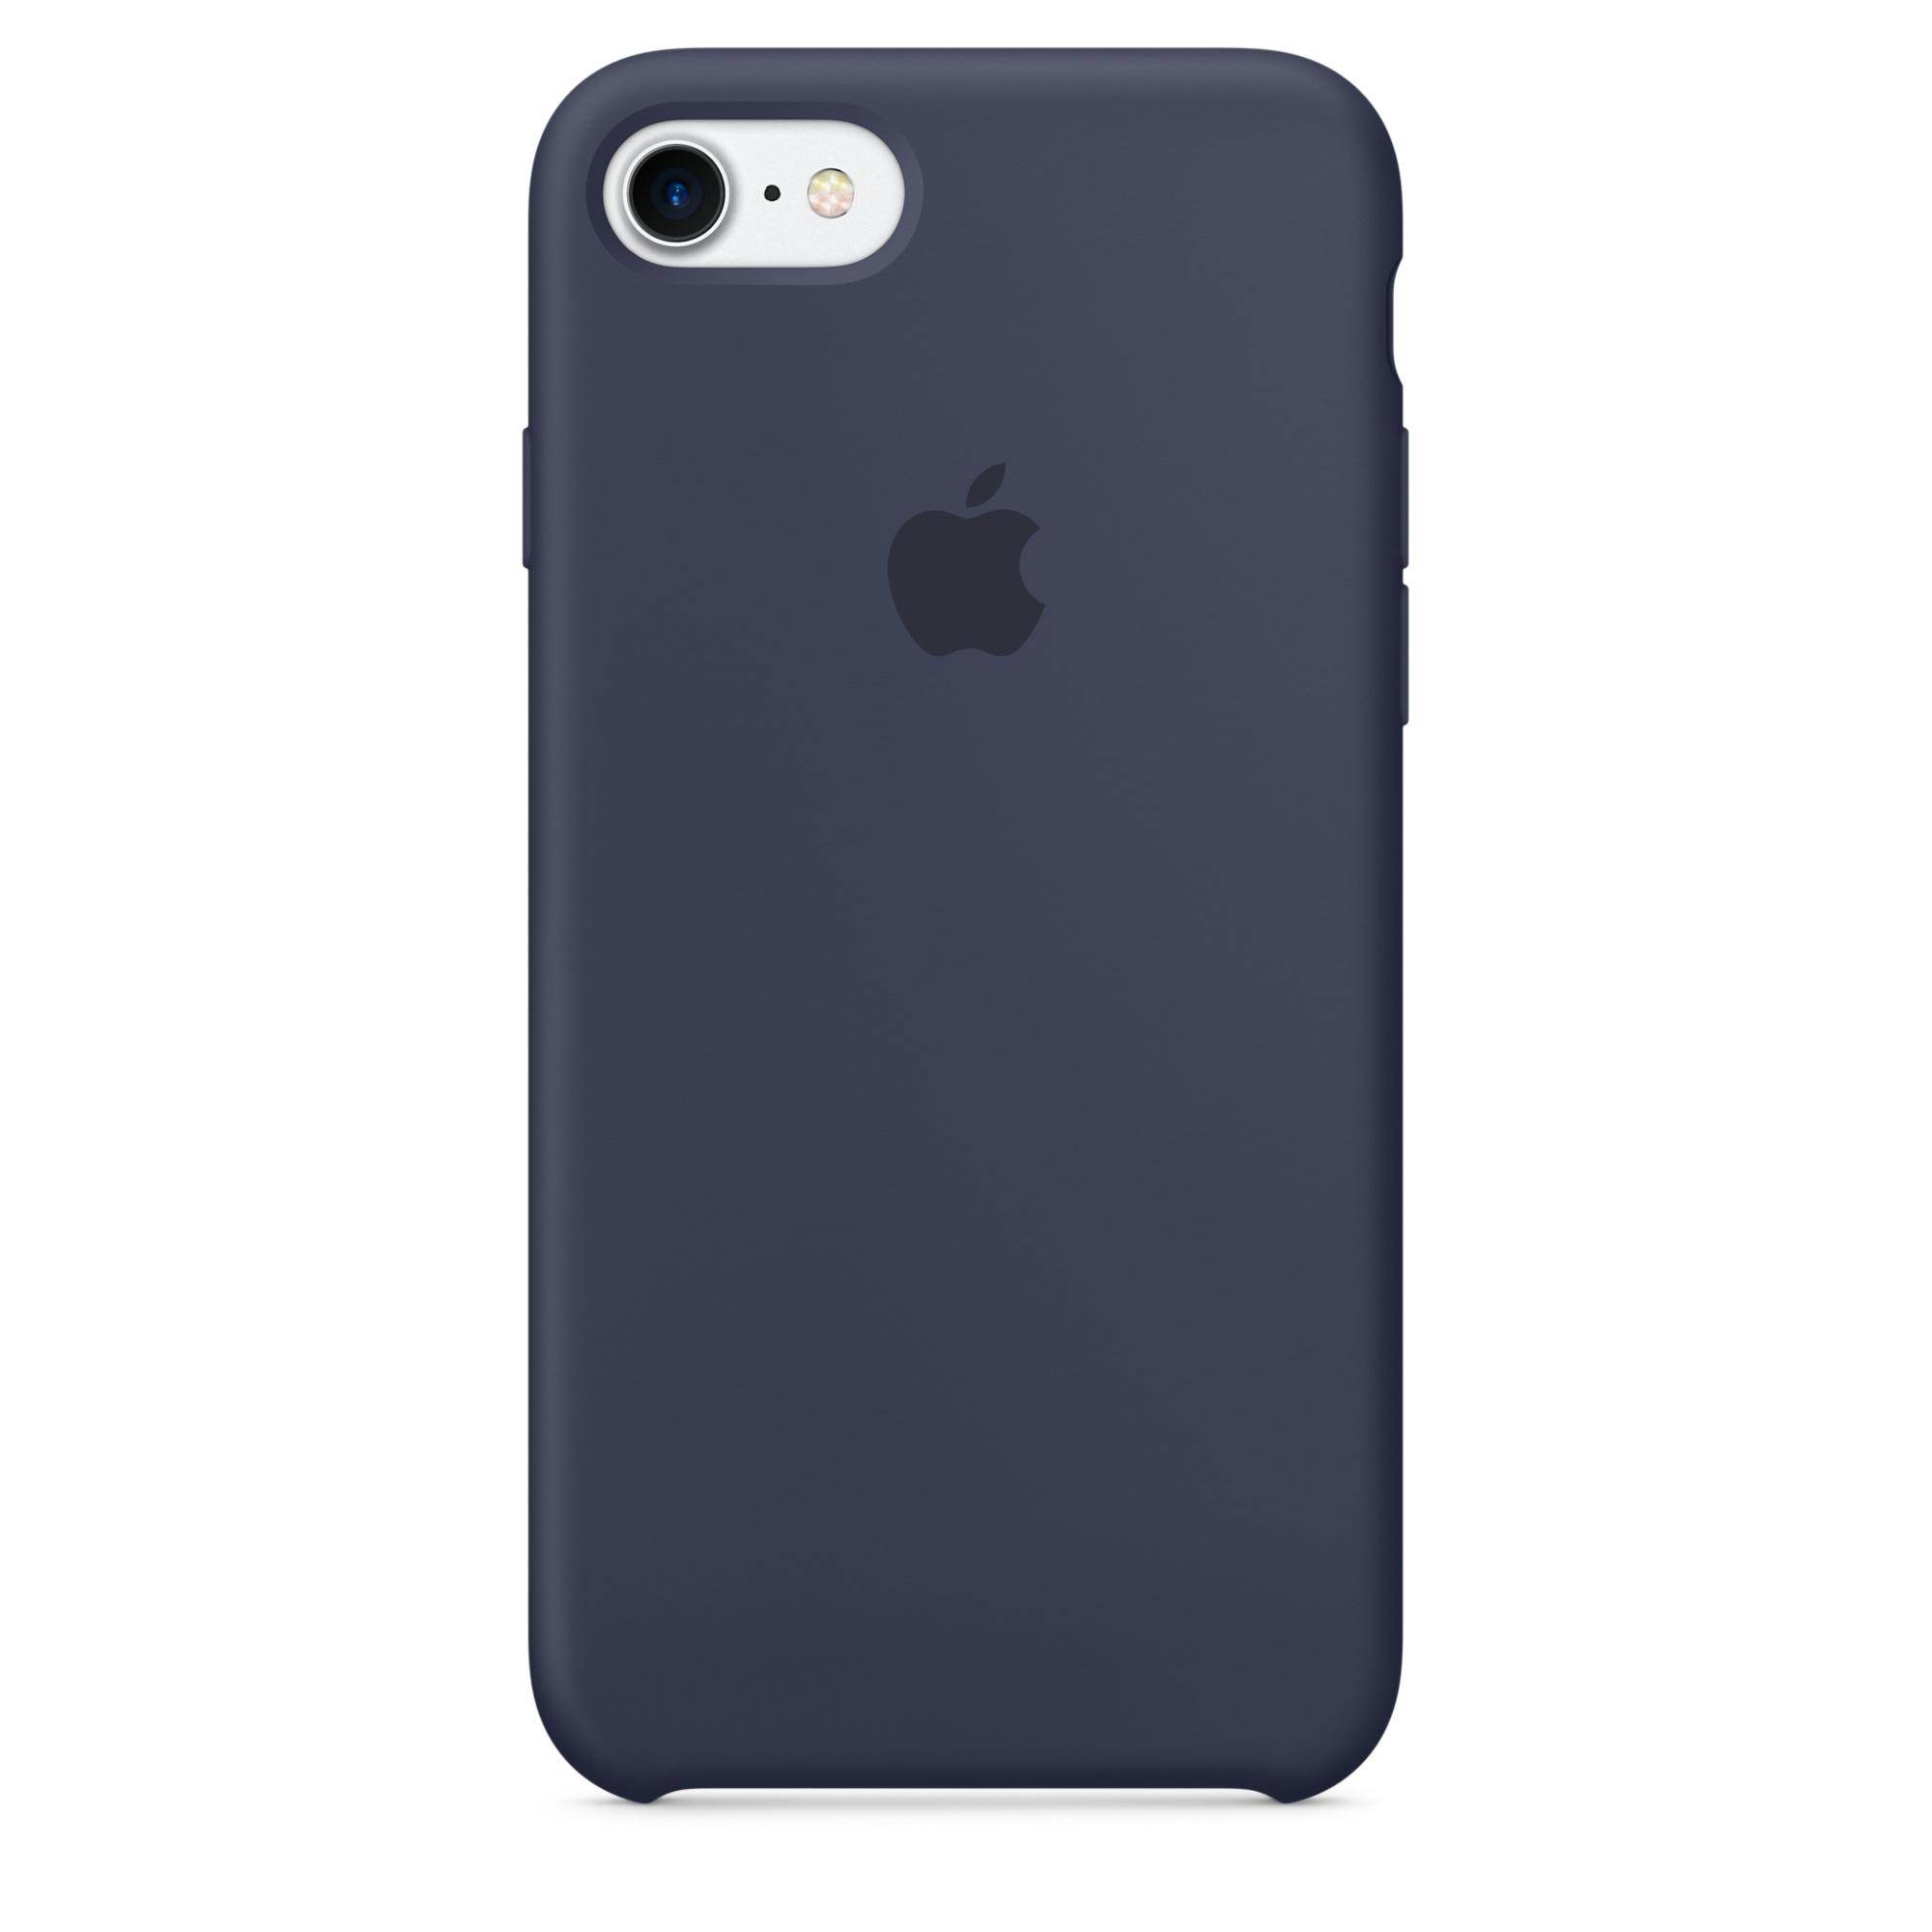 Ochranný kryt pro iPhone 7 - Apple, Silicone Case Midnight Blue